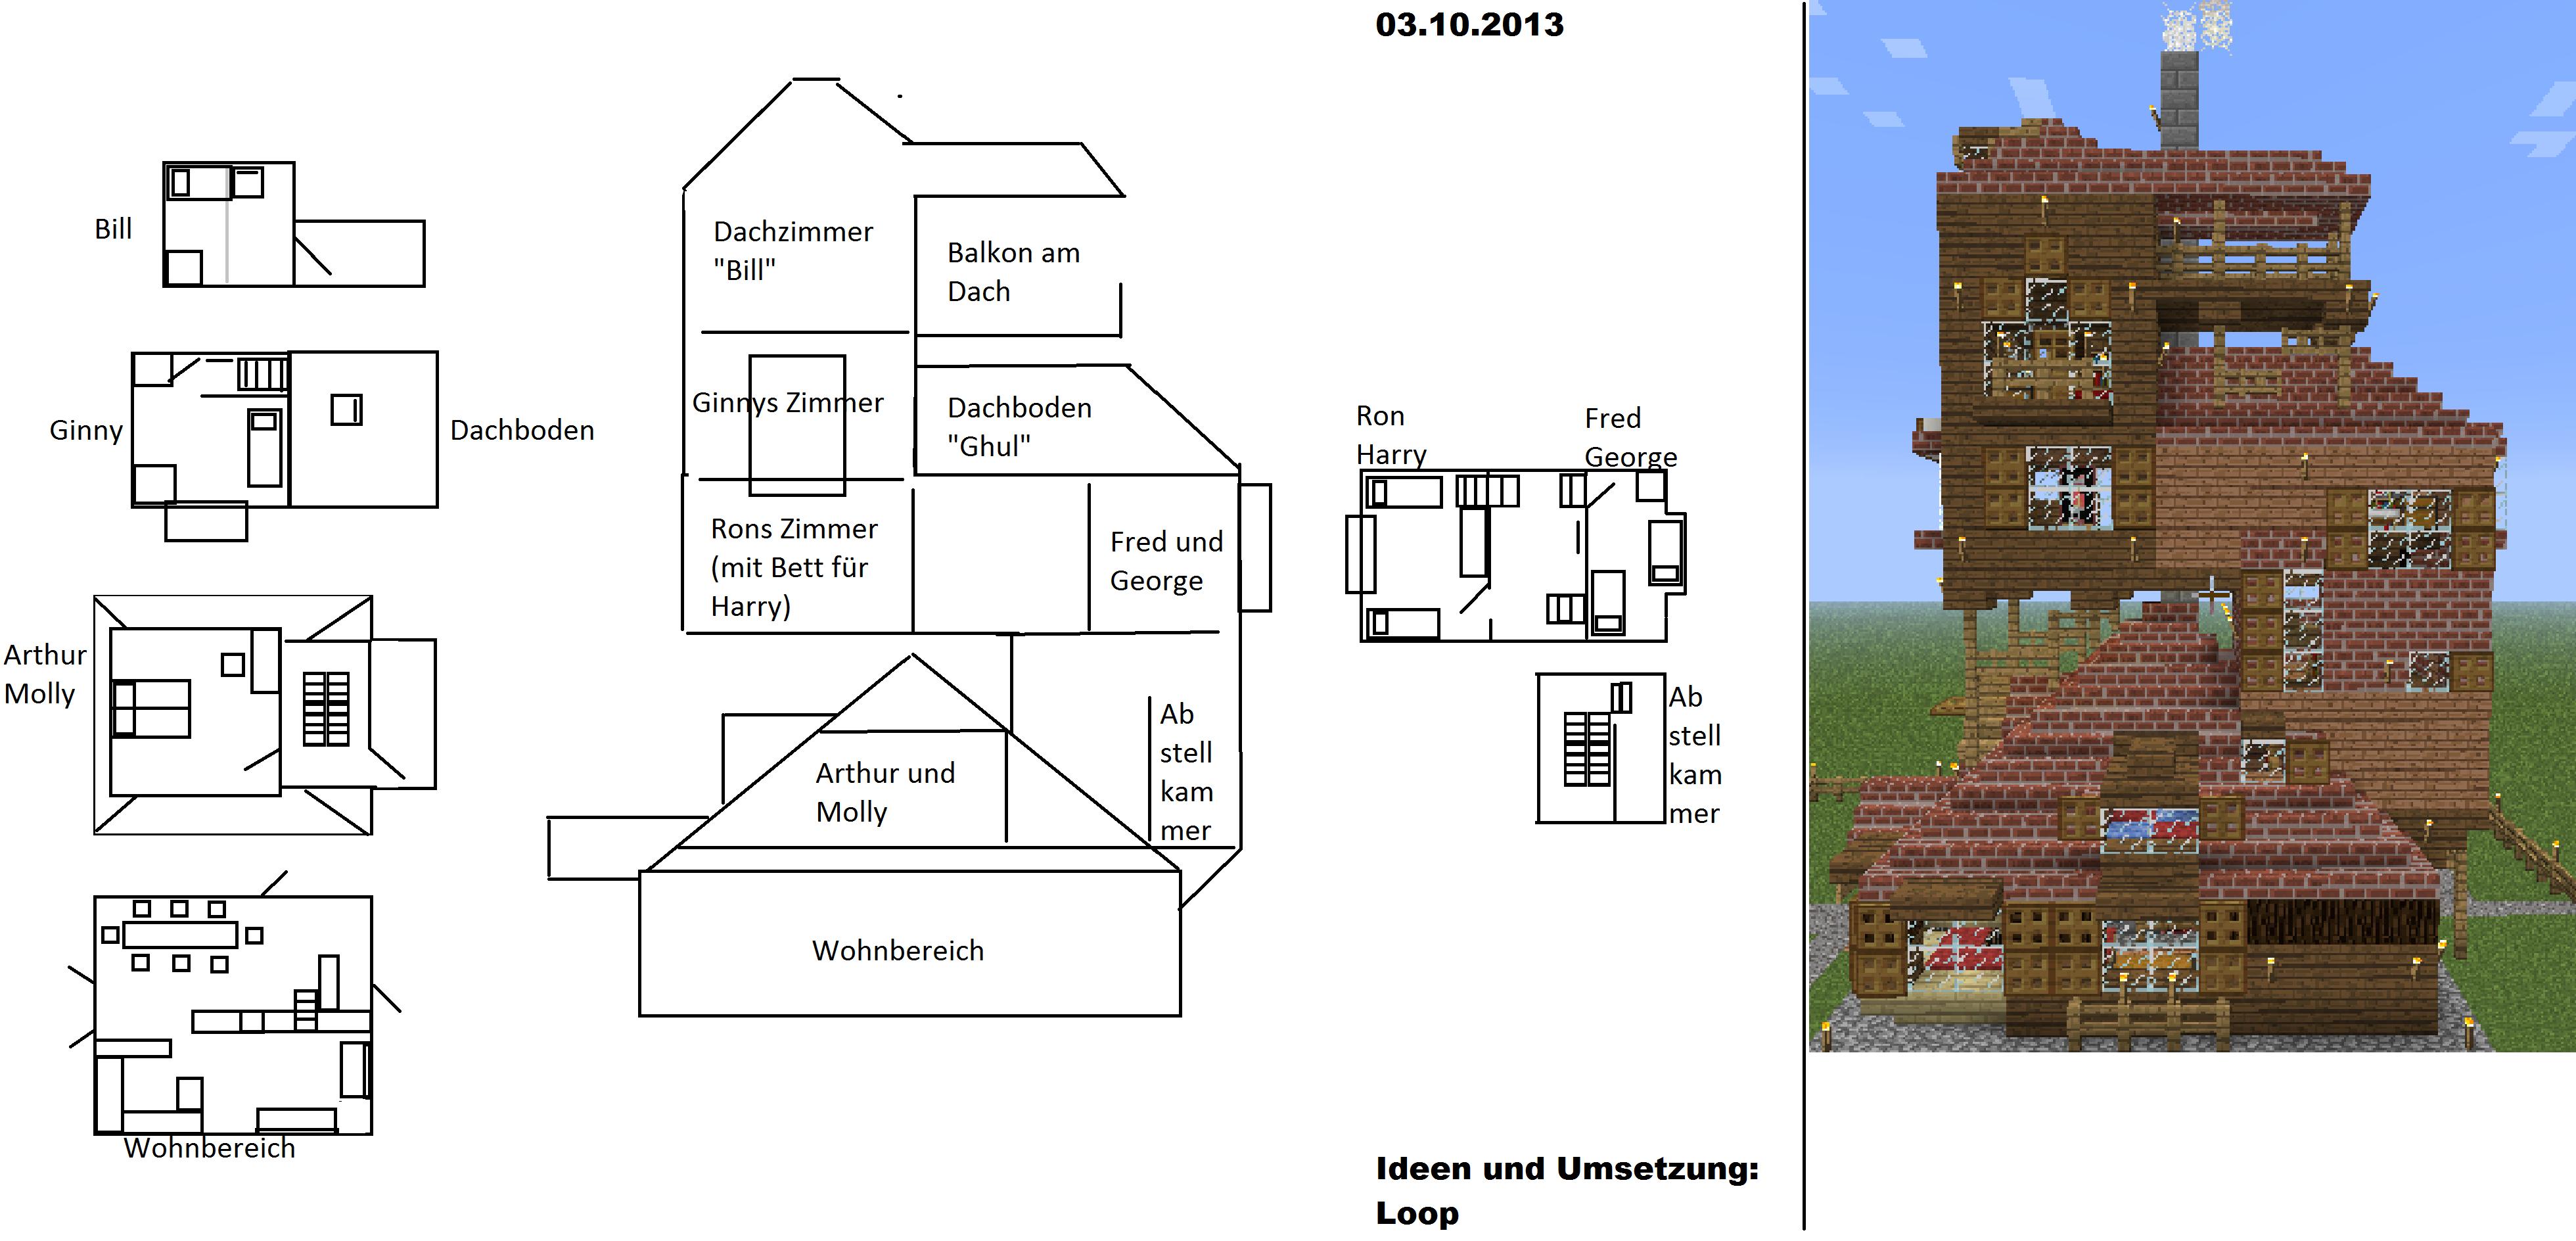 Beste Post Rahmen Bauplan Fotos - Bilderrahmen Ideen - szurop.info